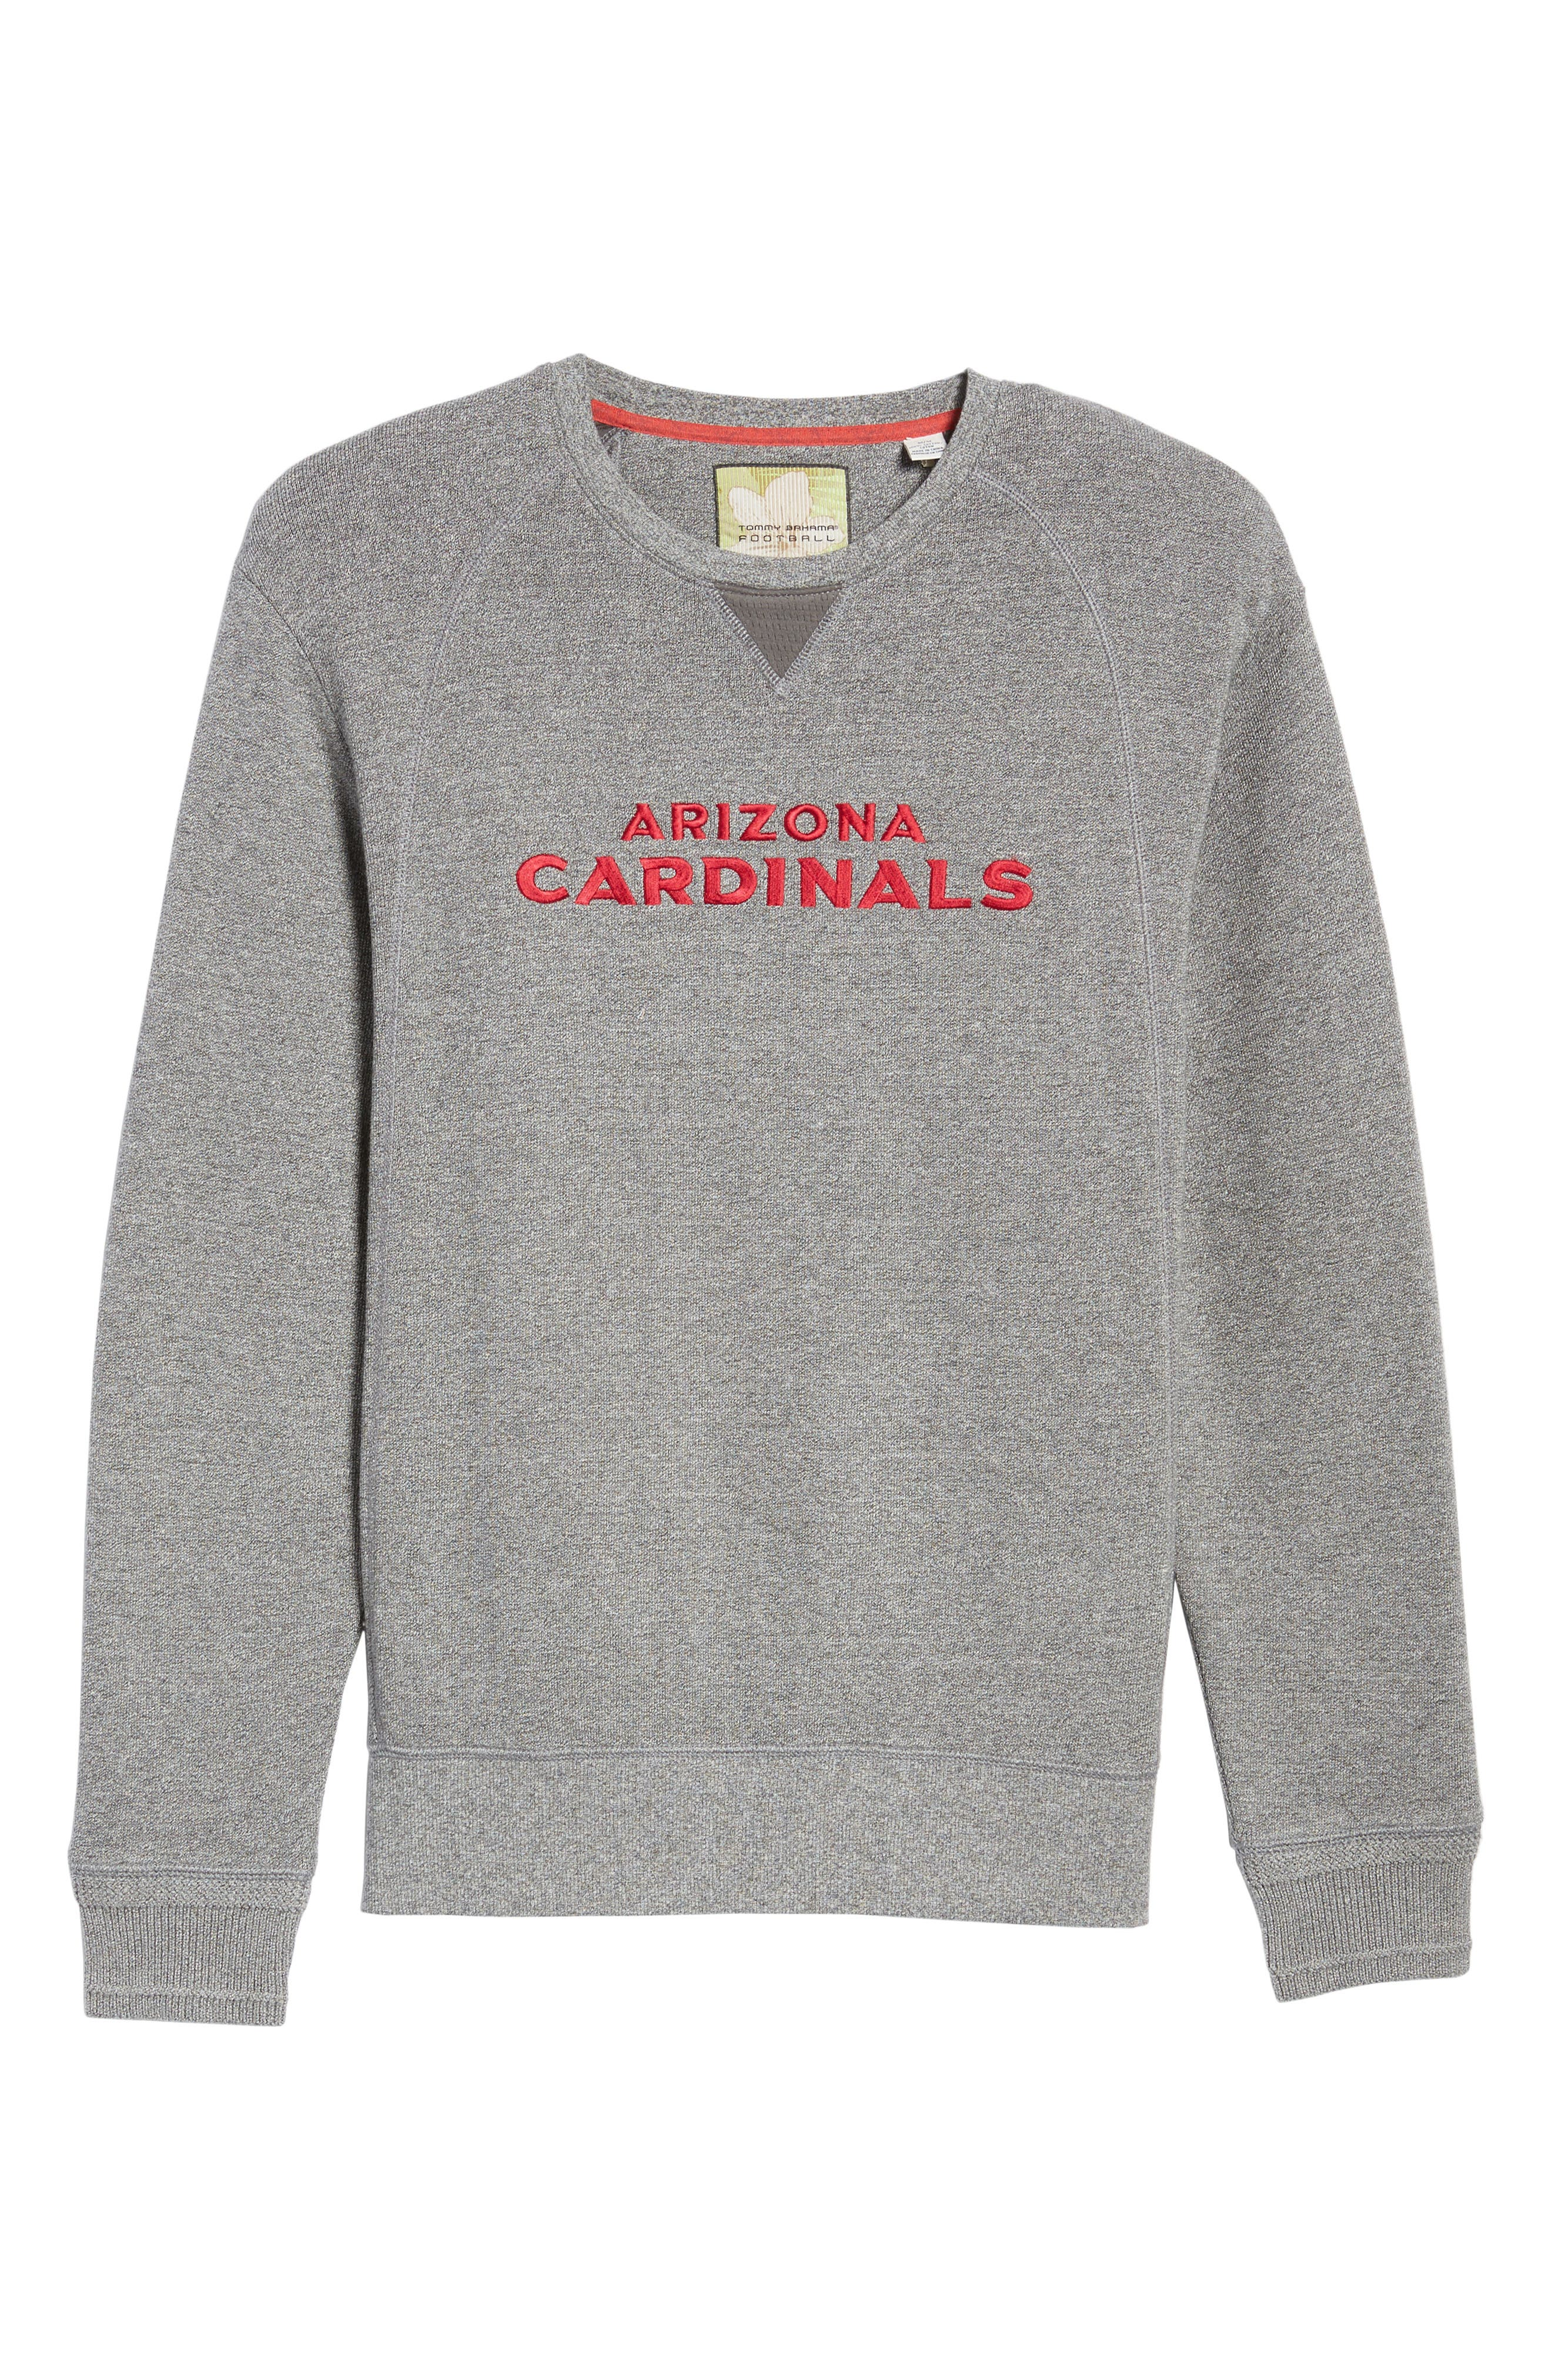 NFL Stitch of Liberty Embroidered Crewneck Sweatshirt,                             Alternate thumbnail 154, color,